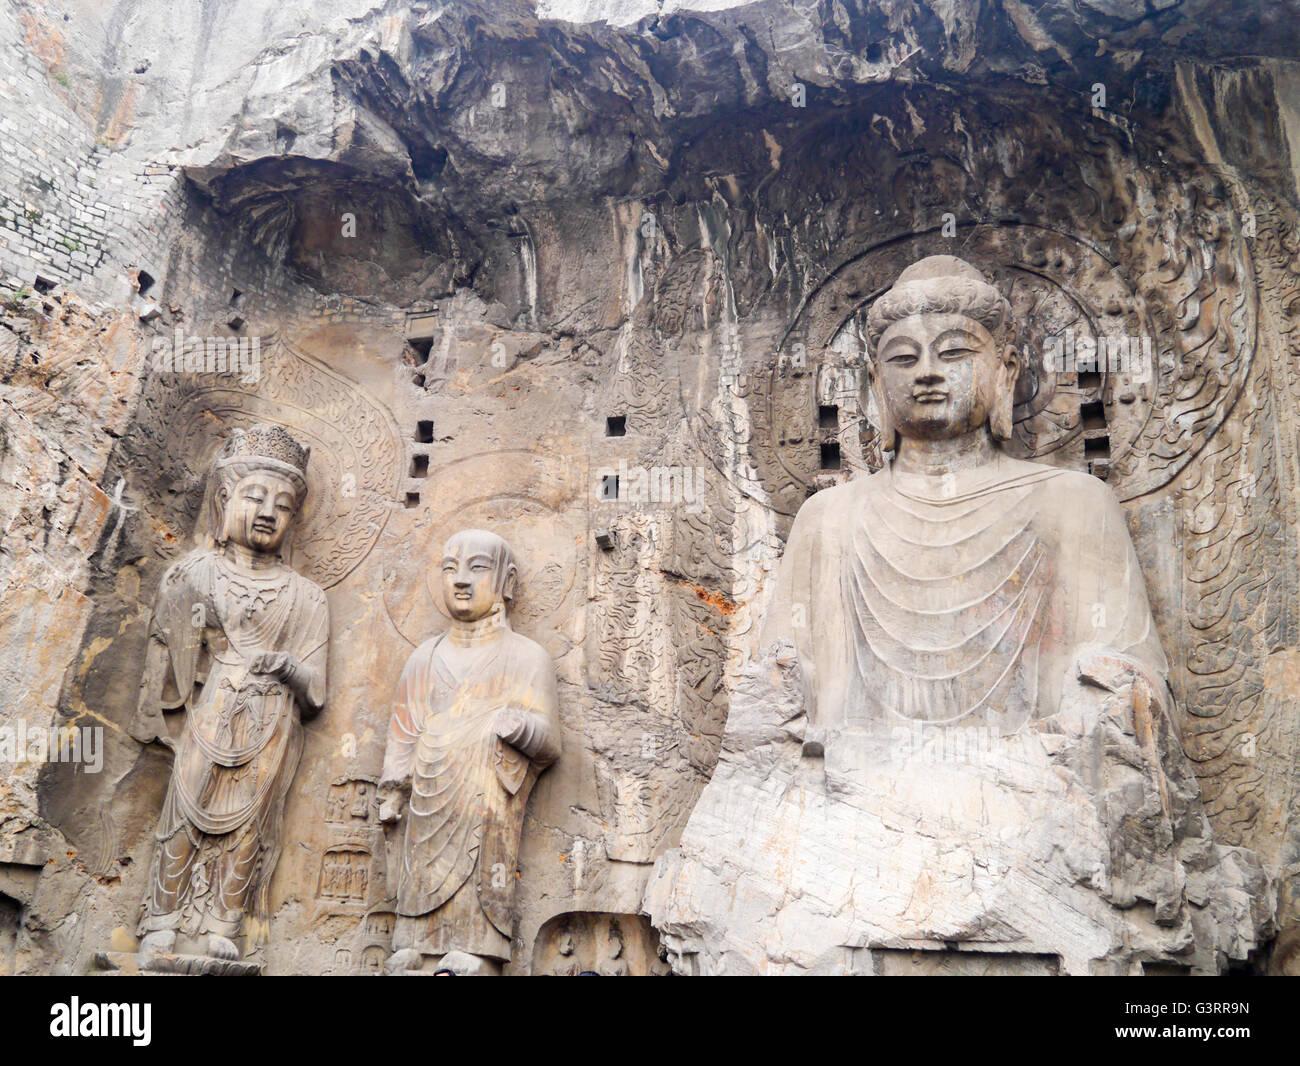 Longmen Grottoes in Luoyang, Henan Province, China. - Stock Image